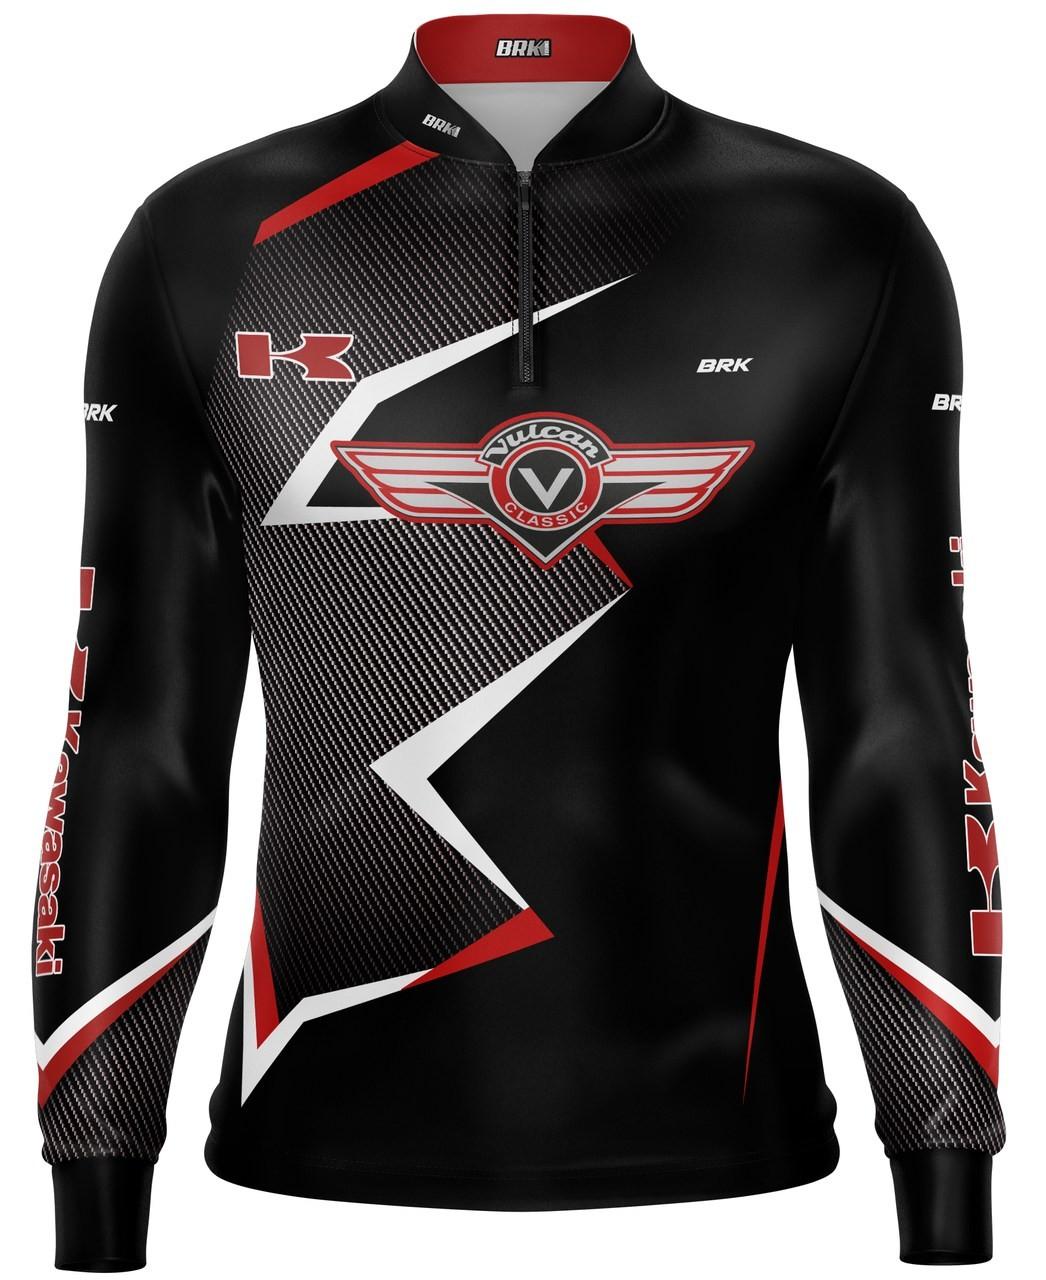 Camiseta Brk Motociclismo Kawasaki Vulcan com FPU 50+